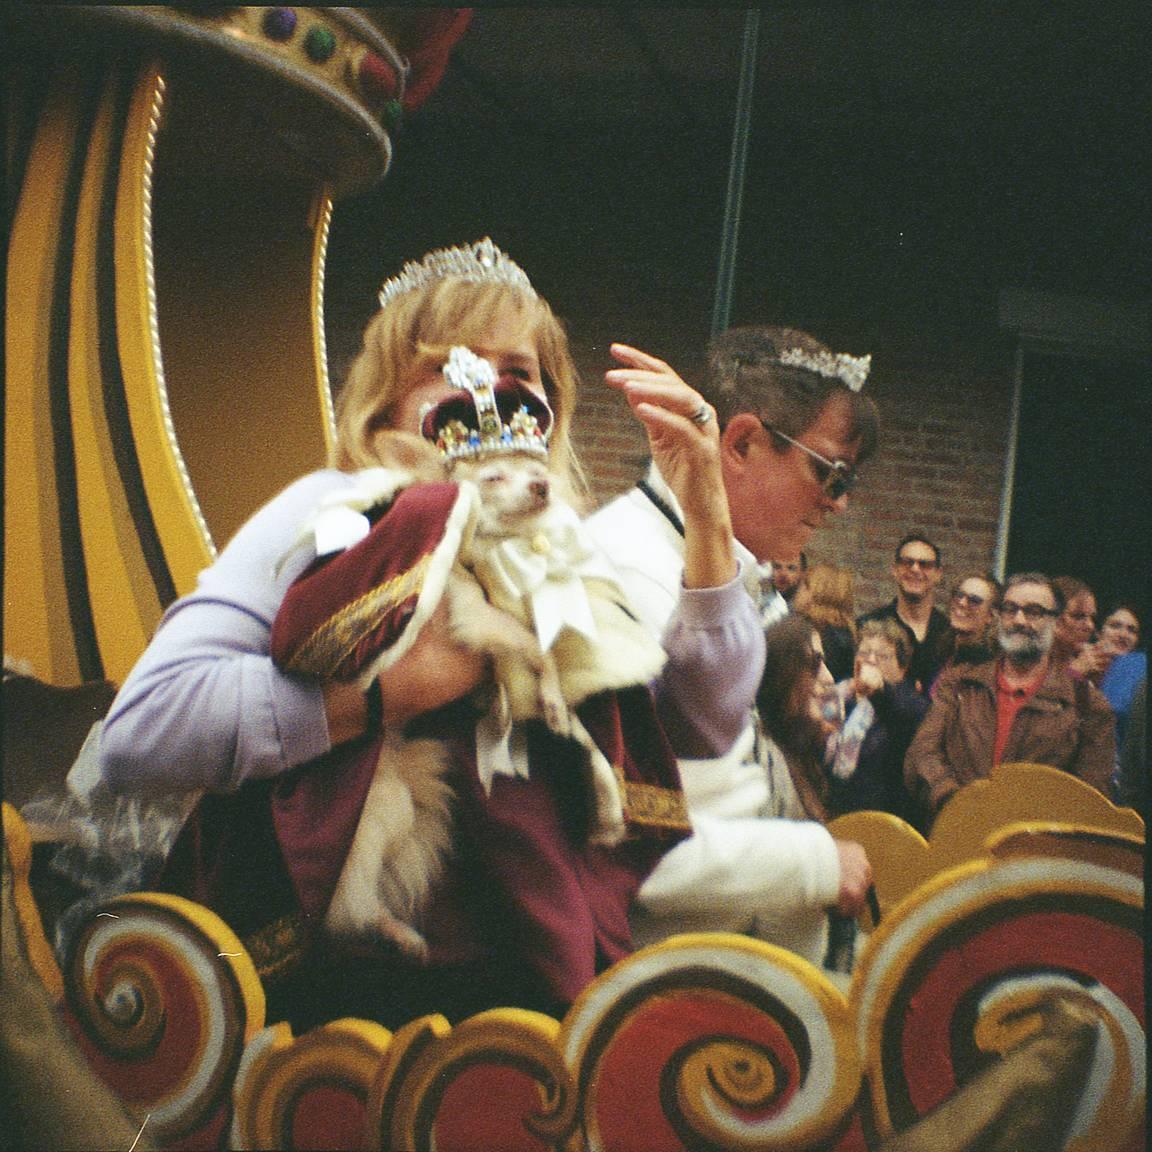 Around the World in Analogue: Mardi Gras in New Orleans with Kandi Cook #mardigras #neworleans #festival https://bit.ly/3c9dItnpic.twitter.com/yEsvbaJ7TE